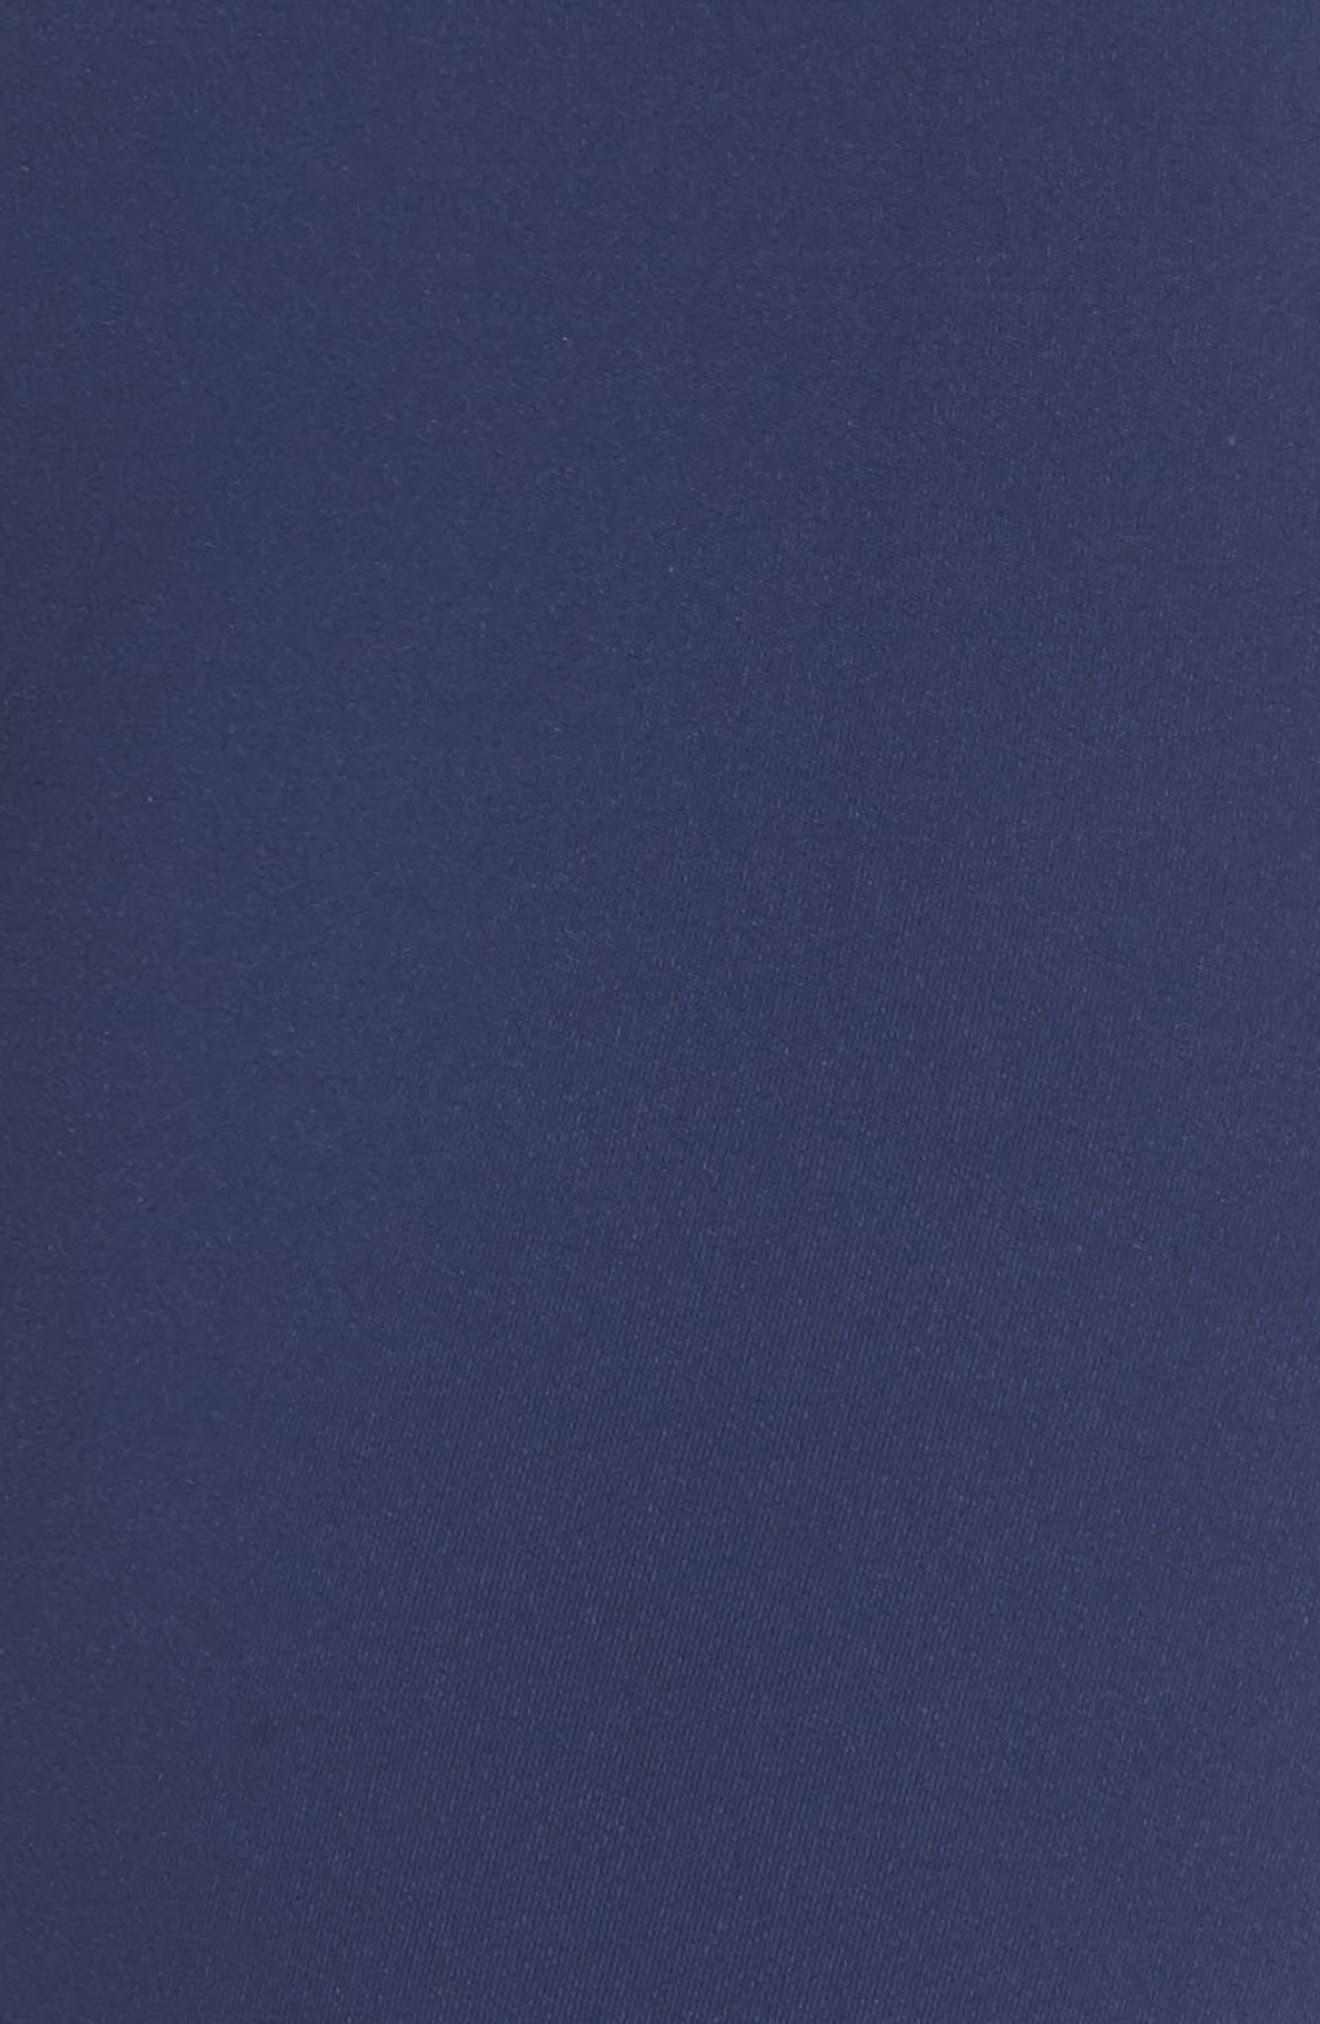 Doran 7/8 Tights,                             Alternate thumbnail 6, color,                             Medieval Blue